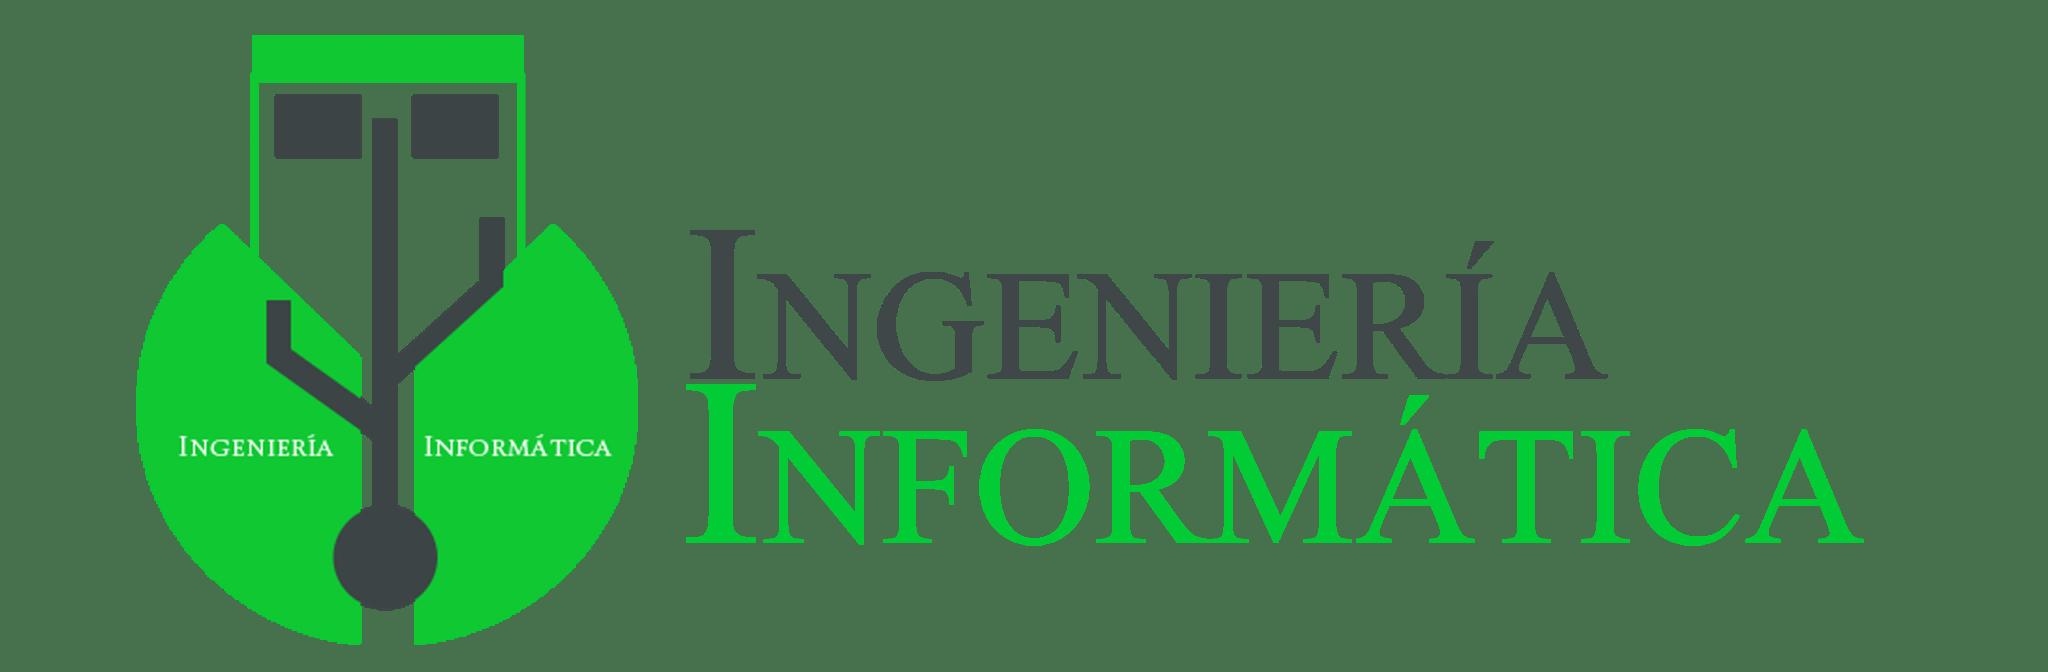 INFORMATICA_HEADING